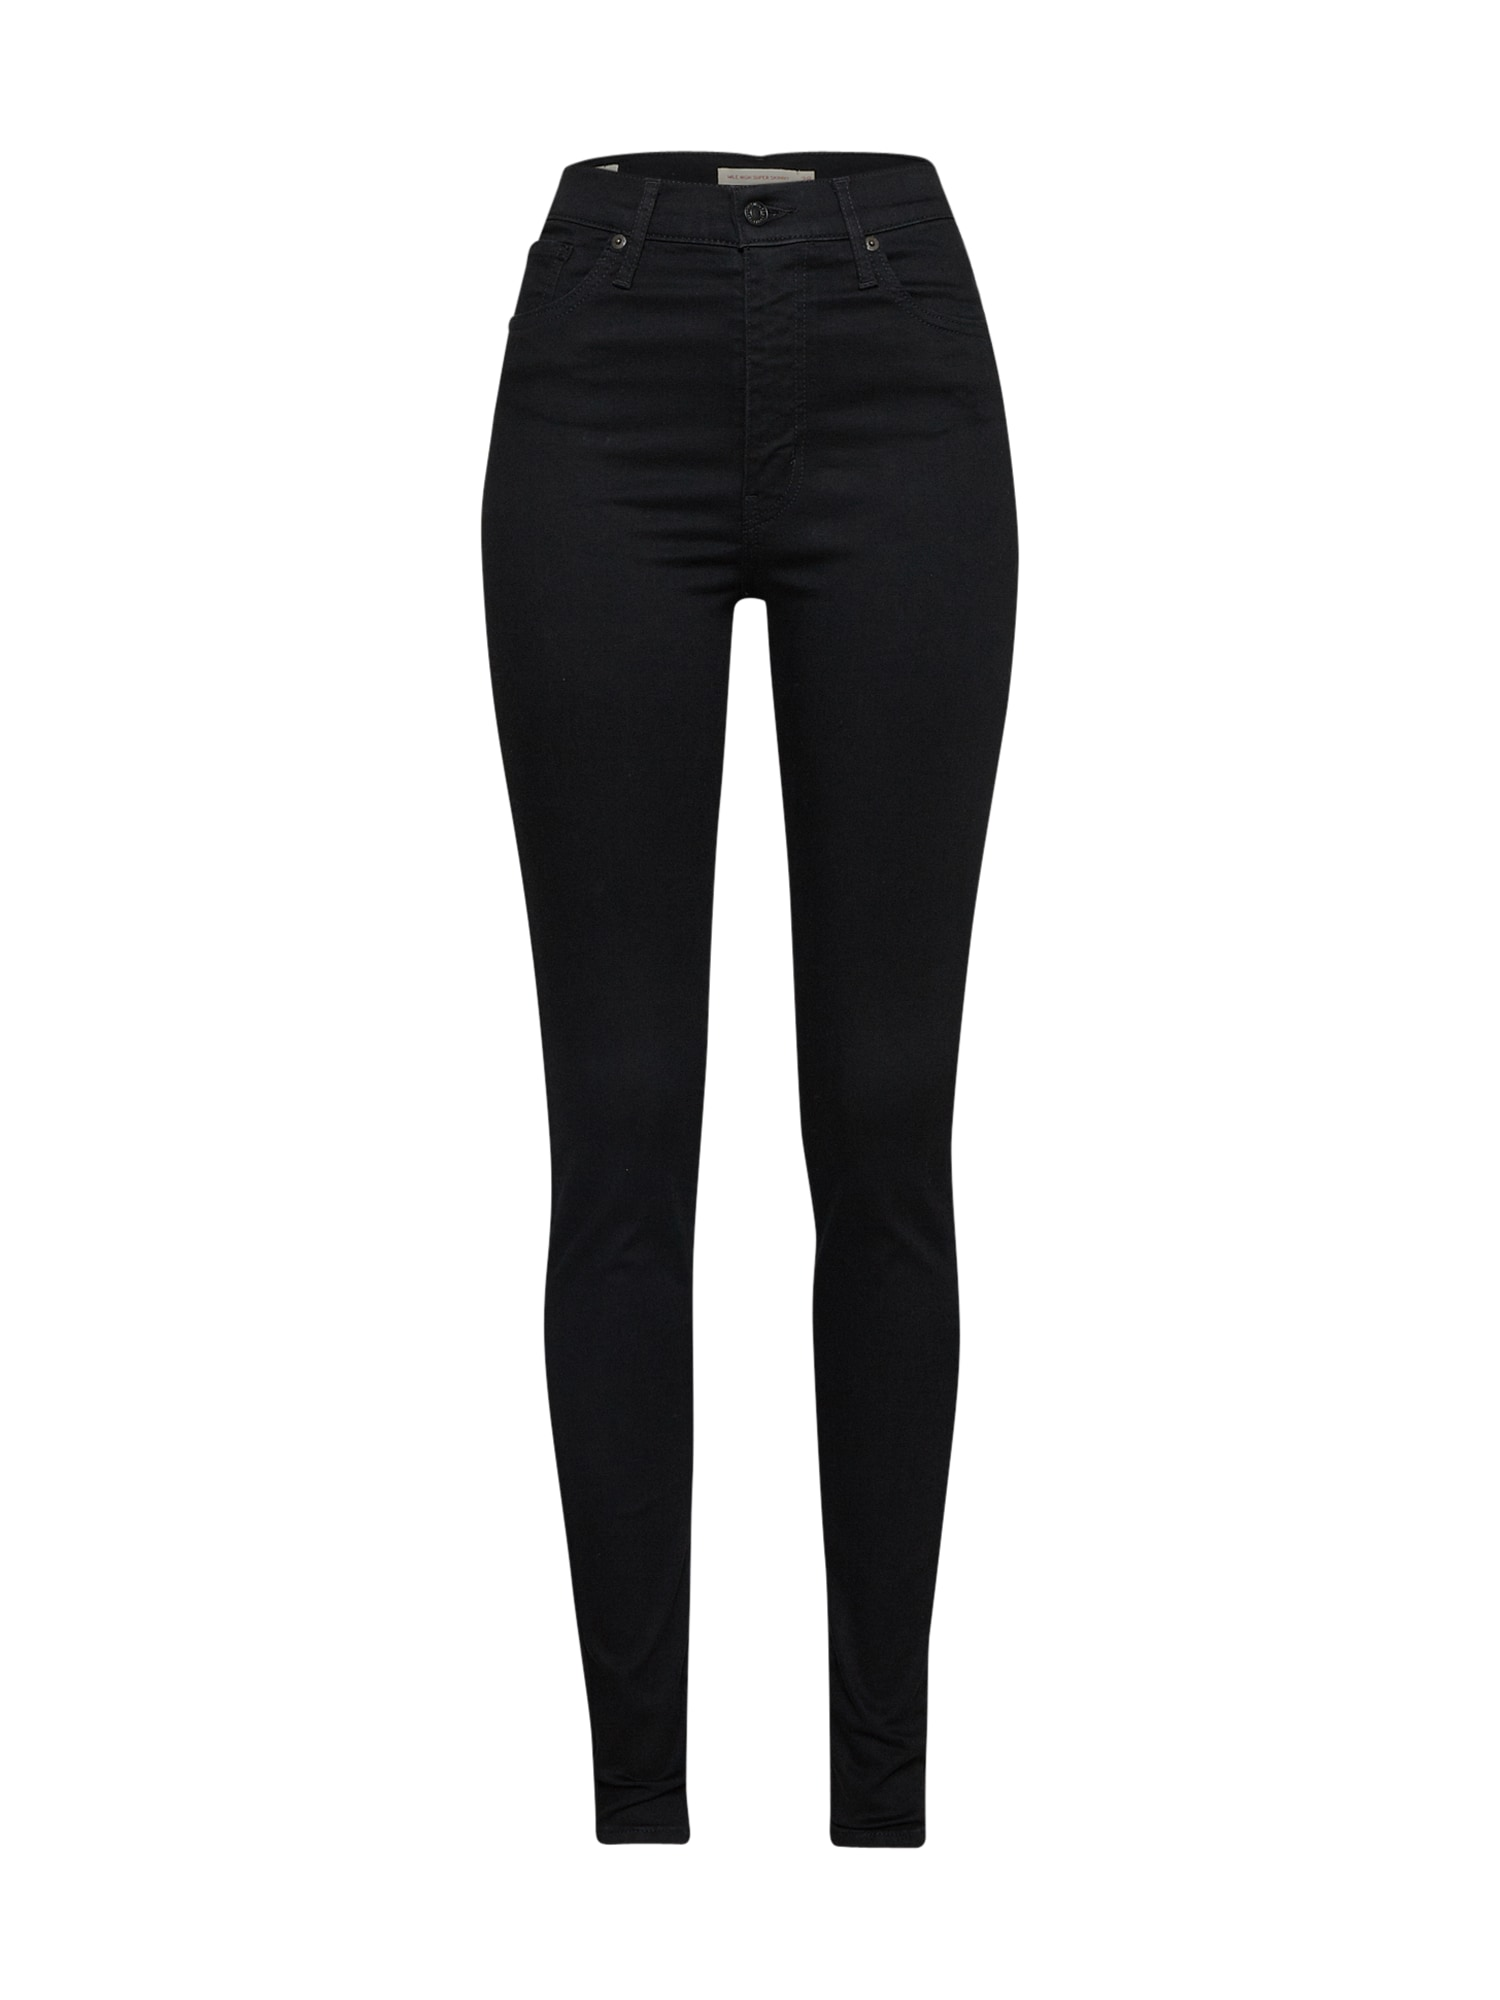 LEVI'S Džínsy 'MILE HIGH Super Skinny'  čierna.